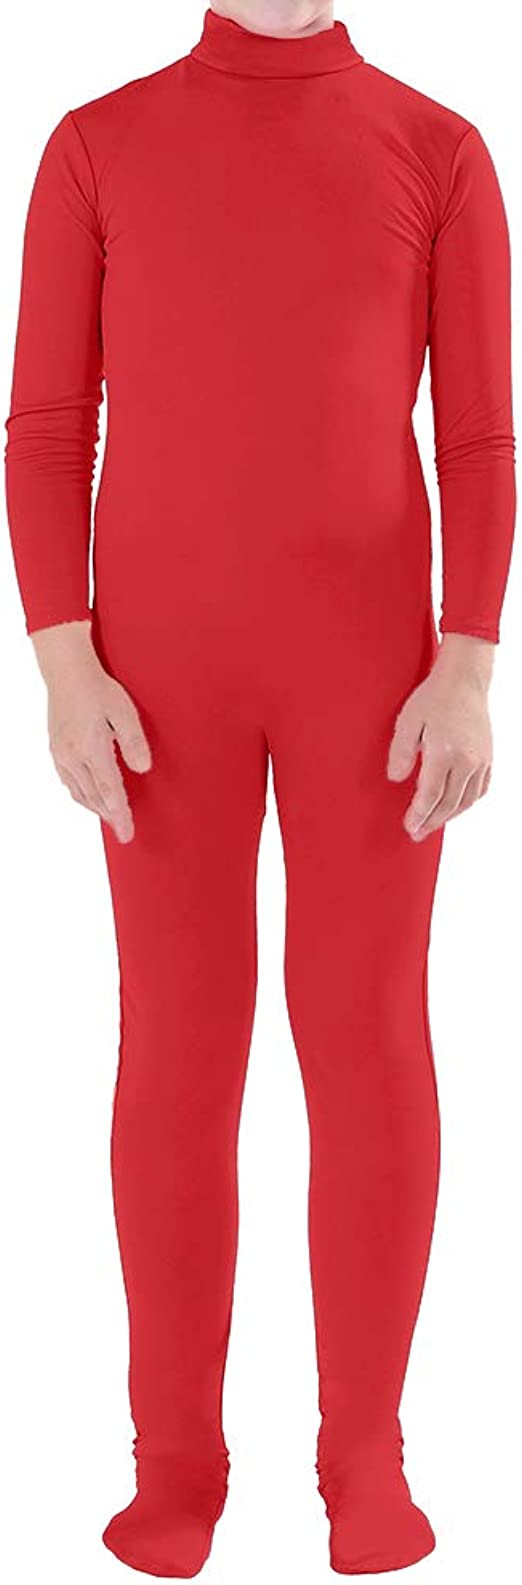 Muka Zentai Unitard Bodysuit Adulto Bambino Costume di Halloween Catsuit Dancewear Beige-Kid L